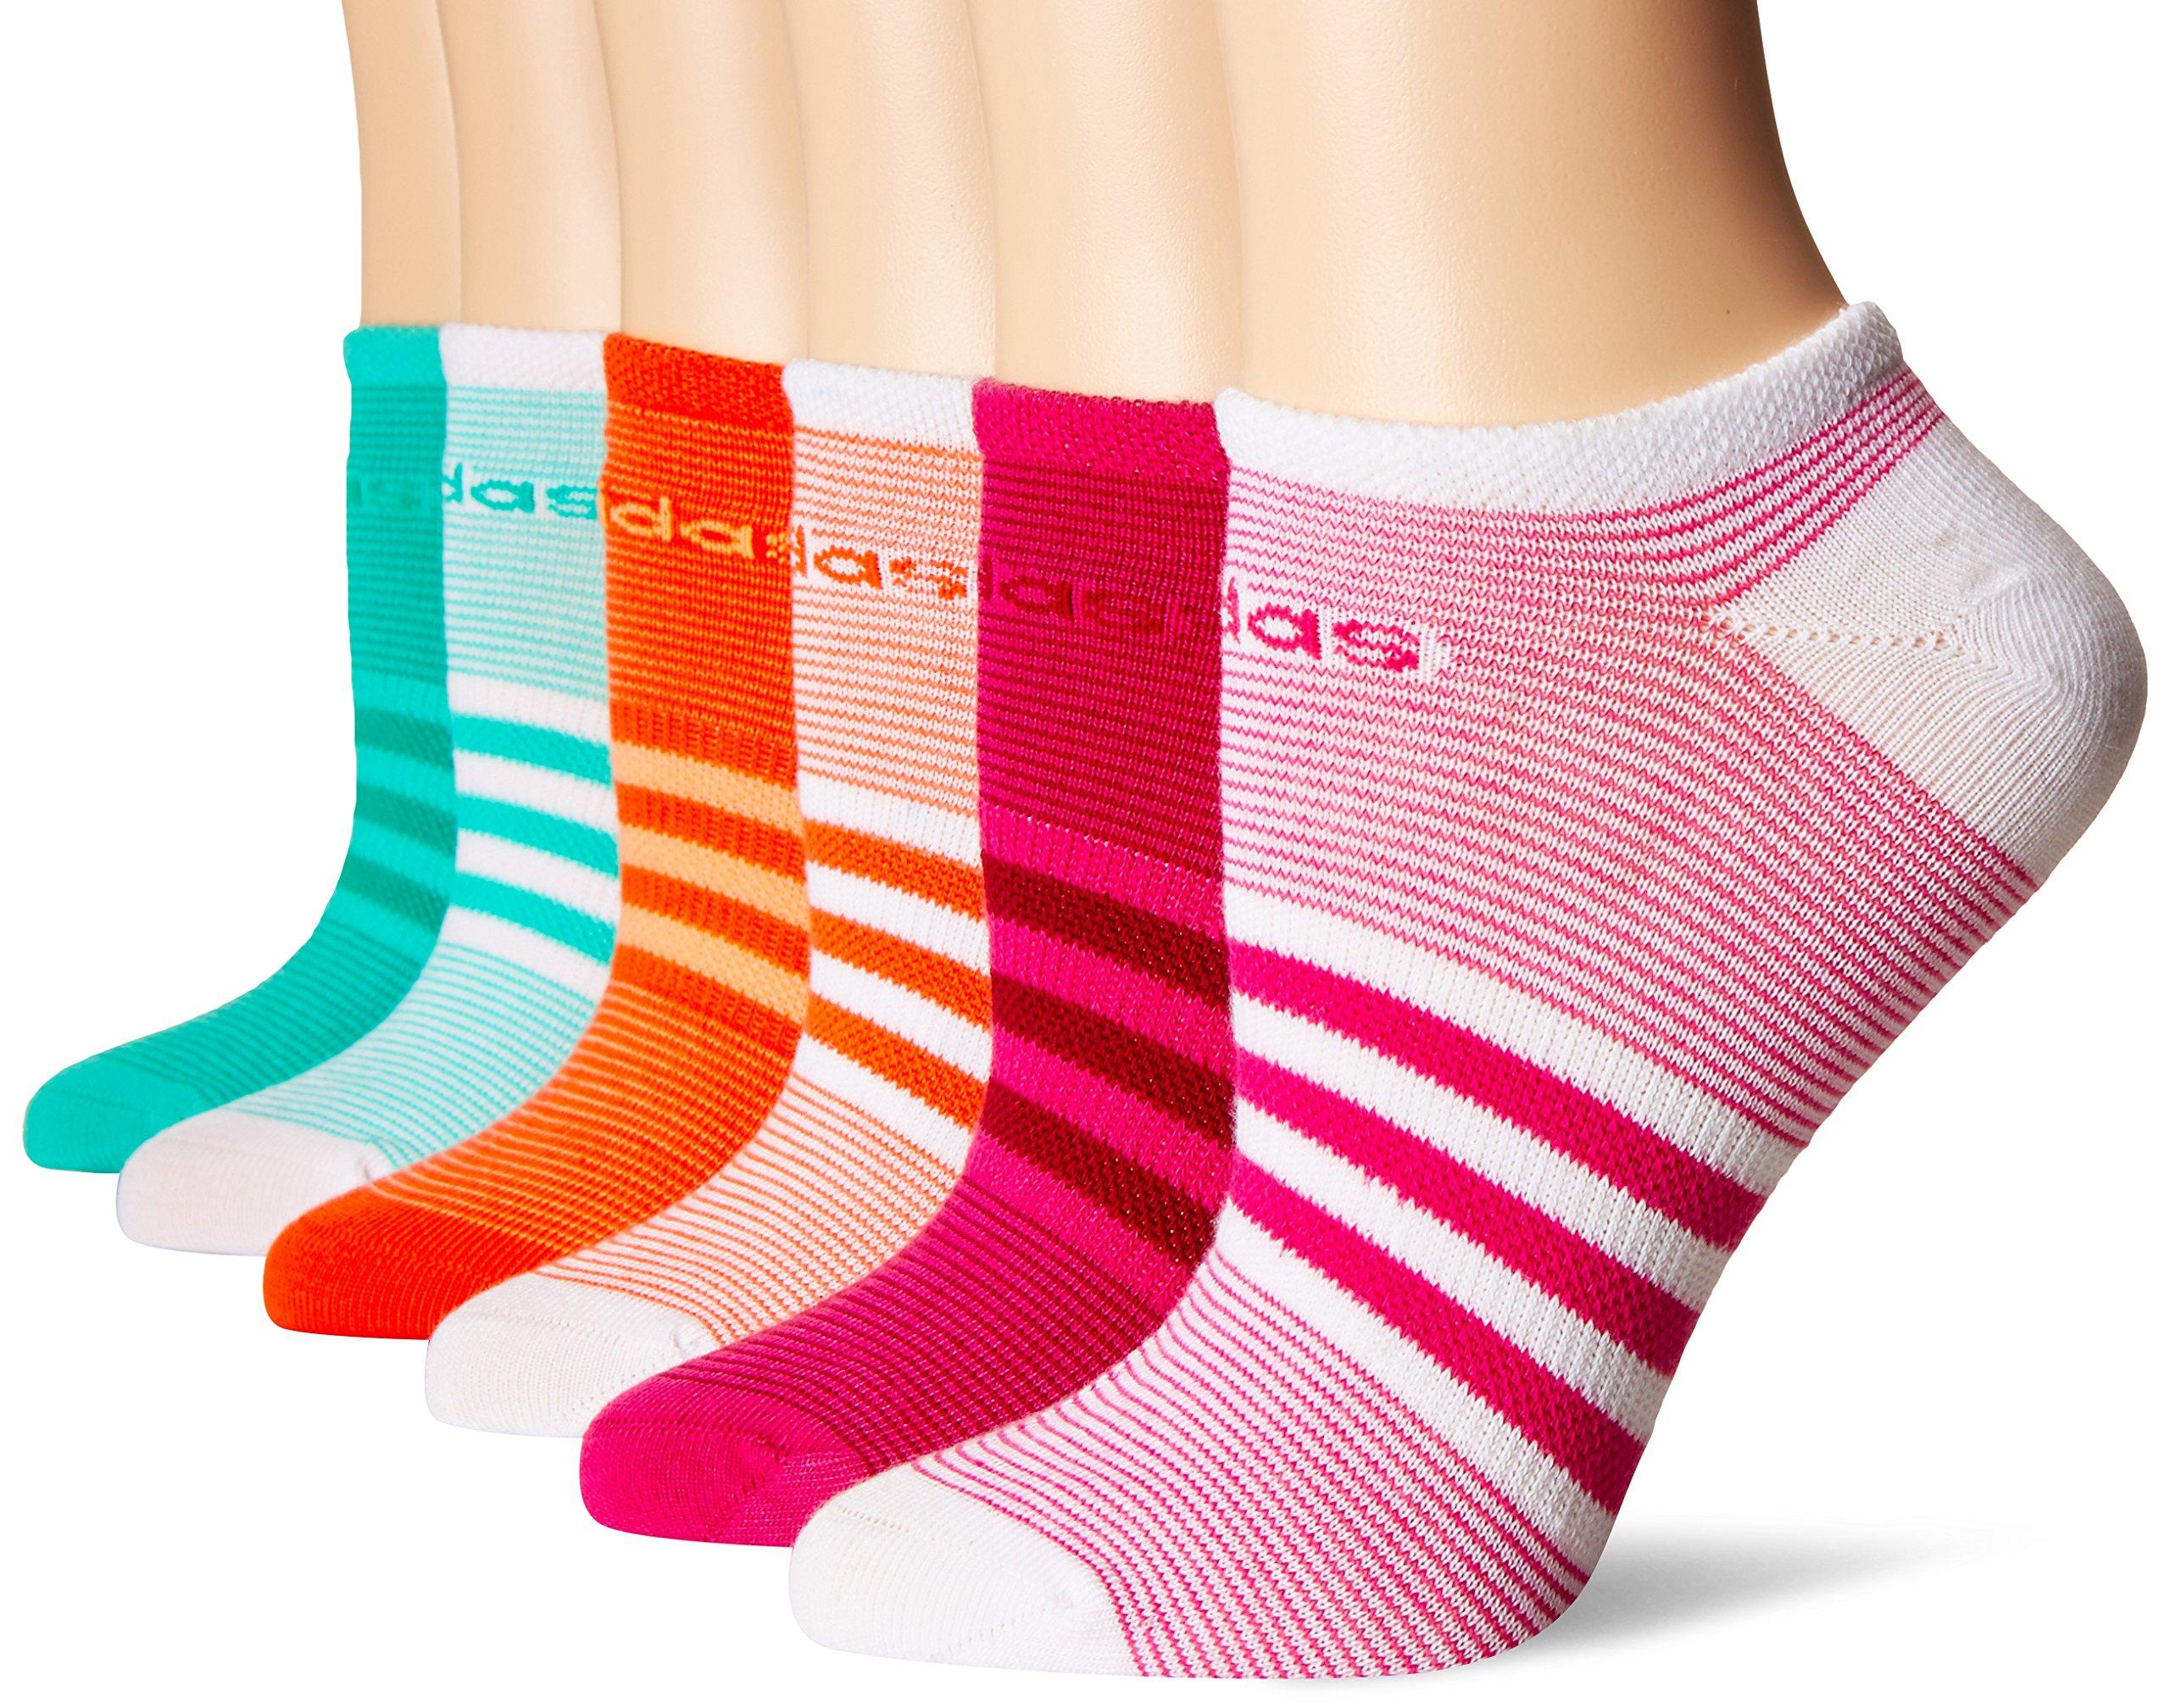 adidas Women's Superlite 6-Pack No Show Socks, Bahia Magenta/Mystery Ruby/Easy Coral/Sun Glow/Bright Green/Core Green/White,Women's Sock size (5-10)